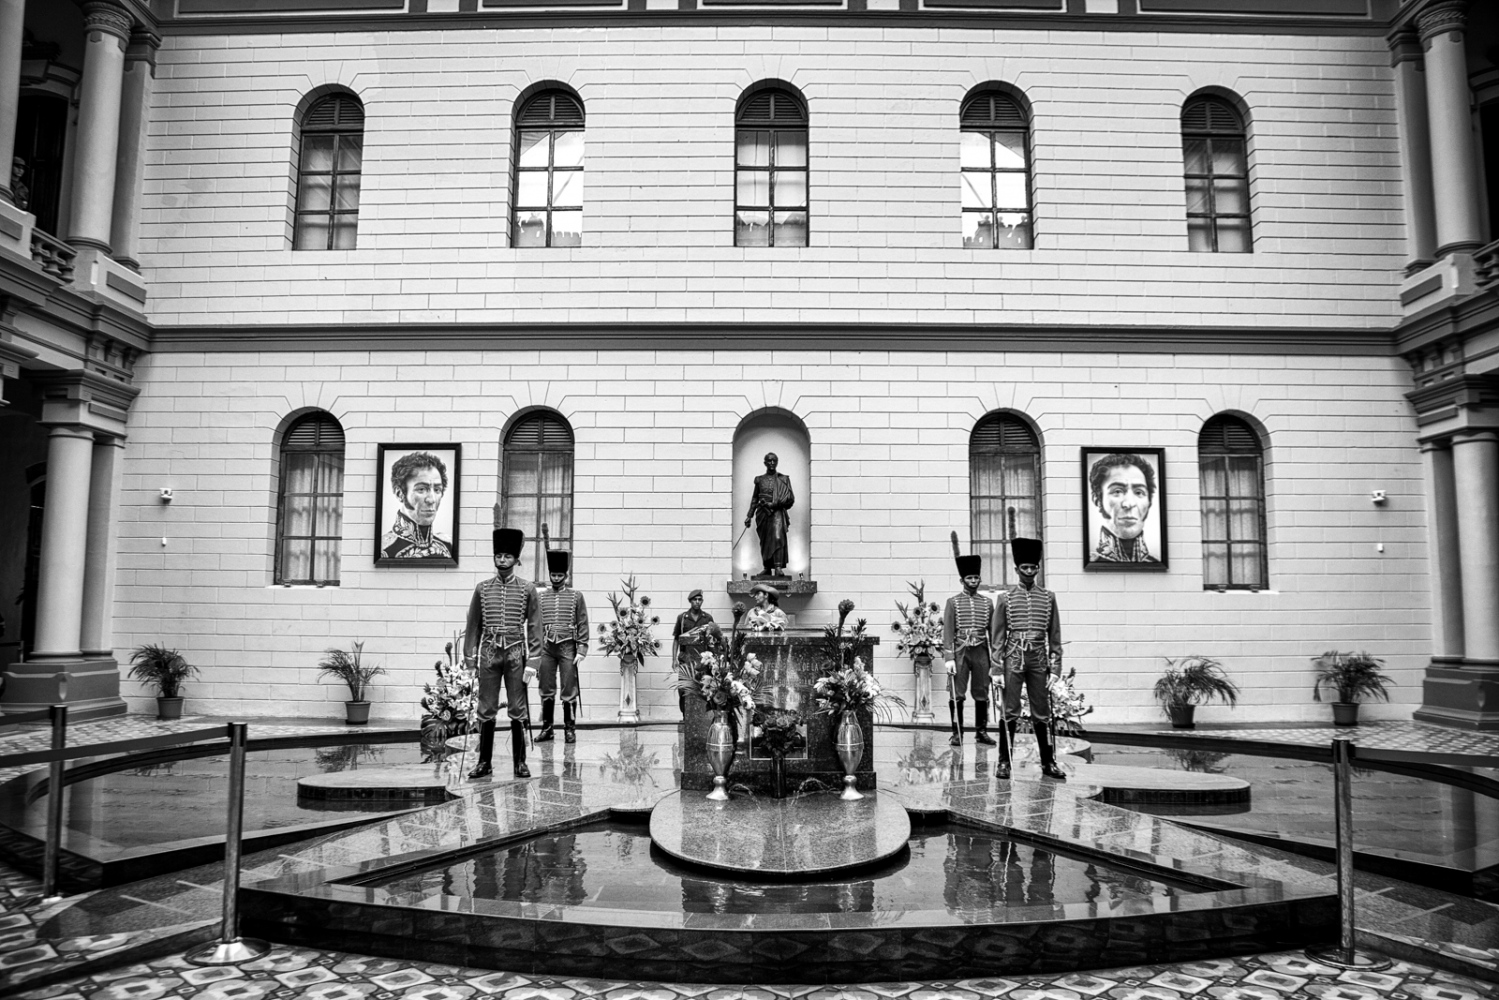 The Guards of Honour keep vigil of the President's corpse at Cuartel de la Montaña .